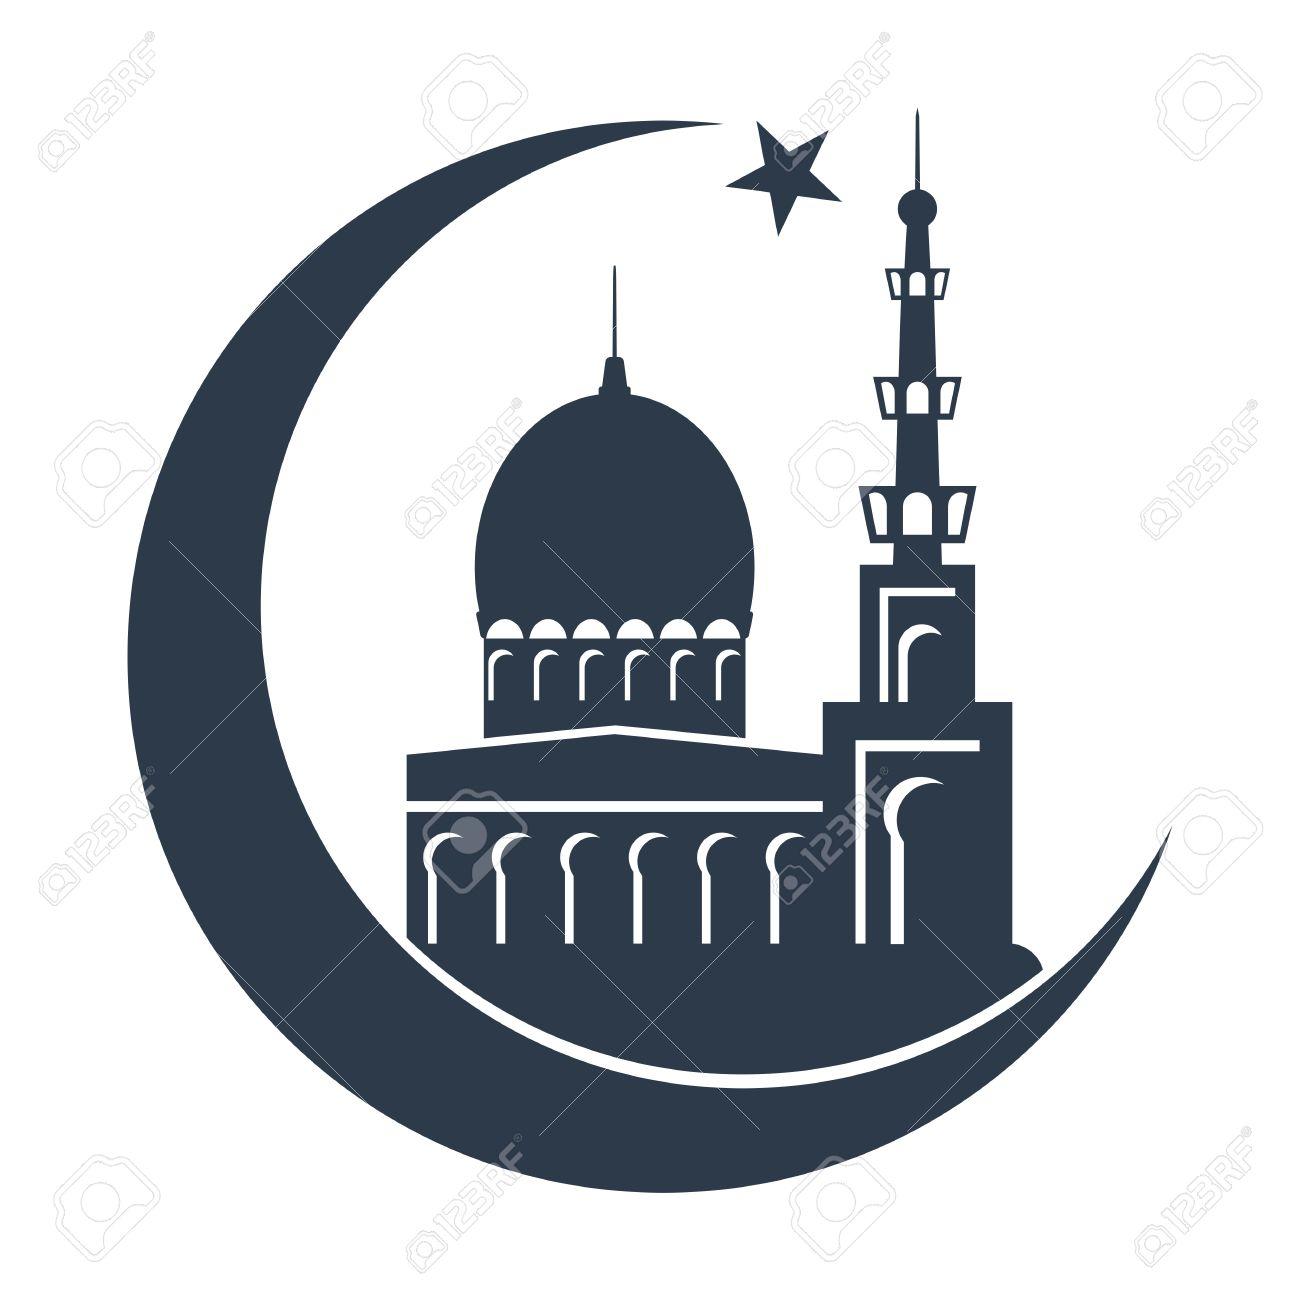 Turkish islamic mosque black silhouette template for holiday turkish islamic mosque black silhouette template for holiday greeting cards arabic booklets brochures kristyandbryce Gallery